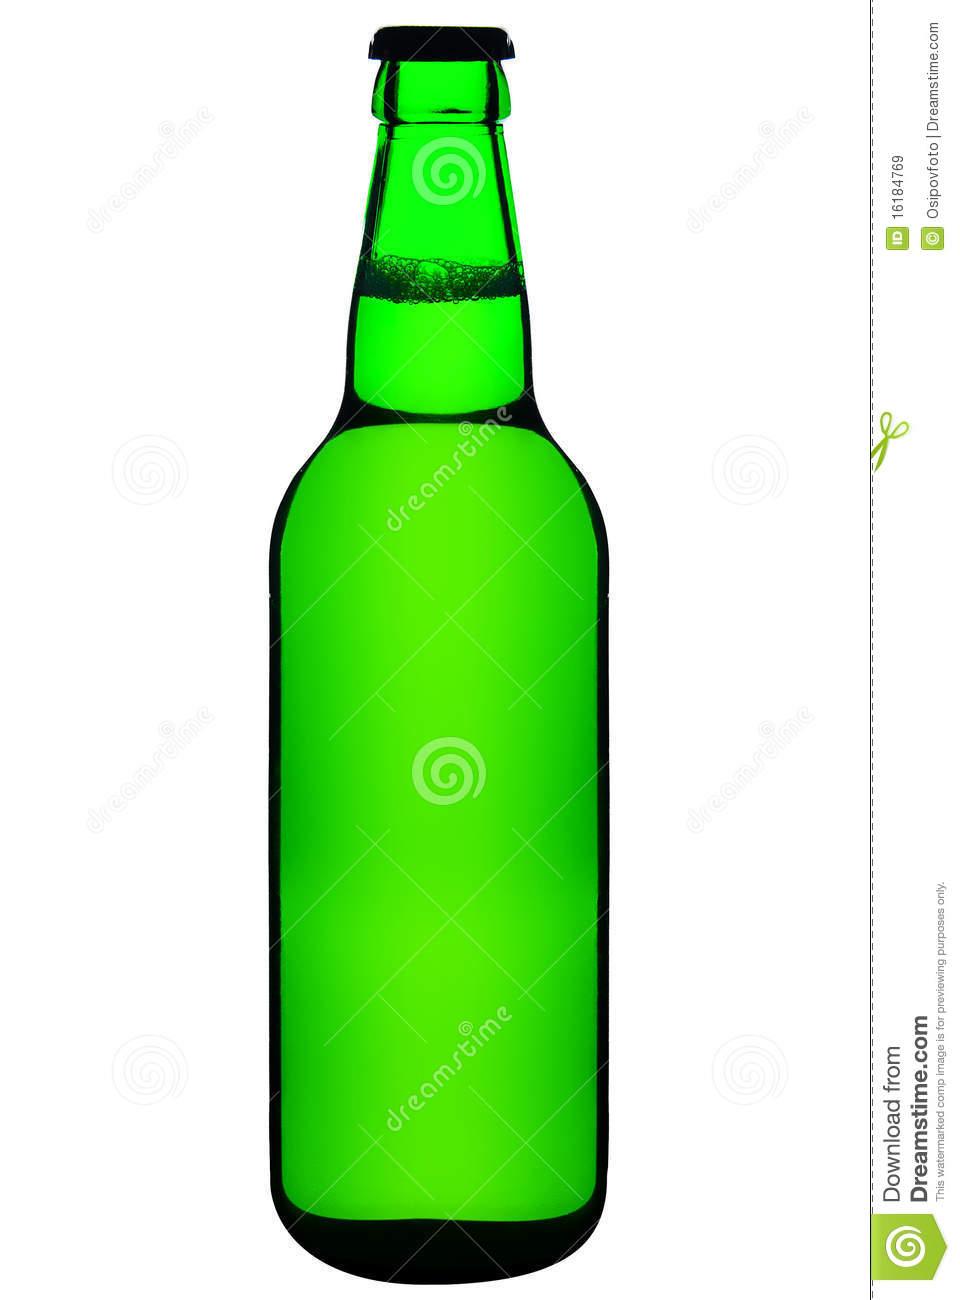 Green Beer Bottle Clipart Closed Green Beer Bottle #GSnJ1w.